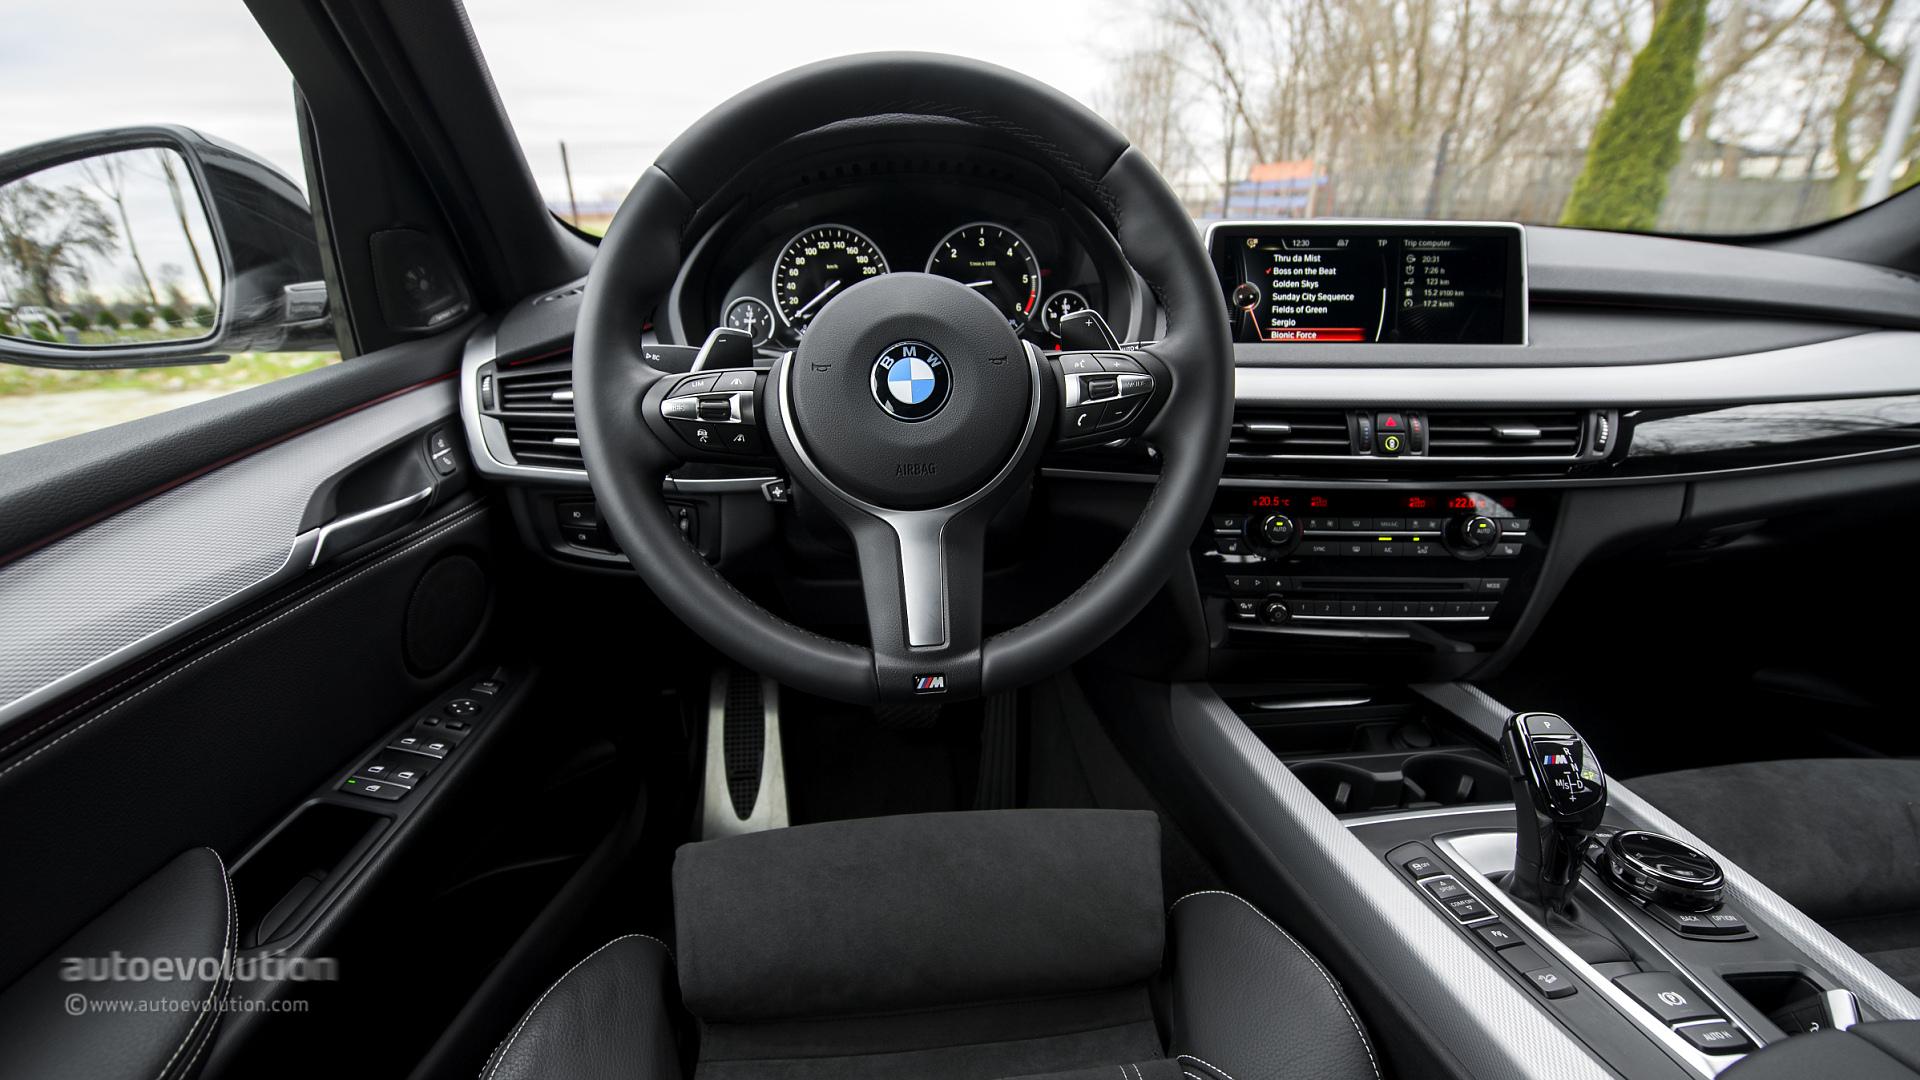 Bmw X5 2017 Interior >> 2014 BMW X5 Review (Page 3) - autoevolution